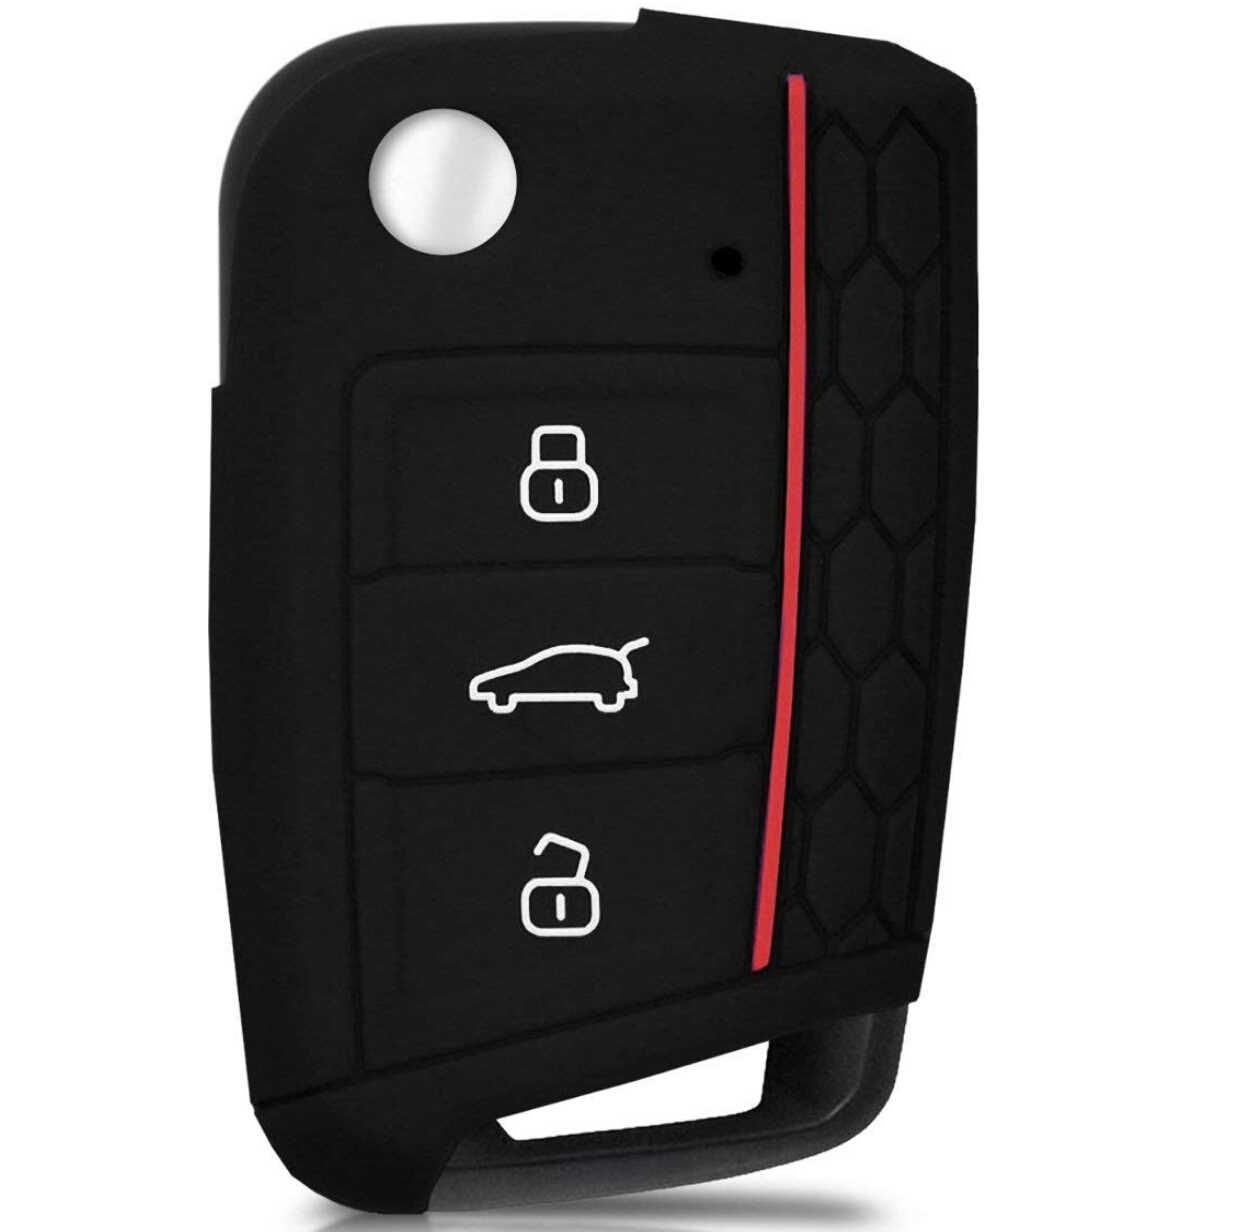 Silicone boîtier porte-clé Pour VW Polo Golf 7 pour Skoda Octavia Kodiaq Karoq pour SIÈGE Ateca Leon Couverture Shell 2016 2017 2018